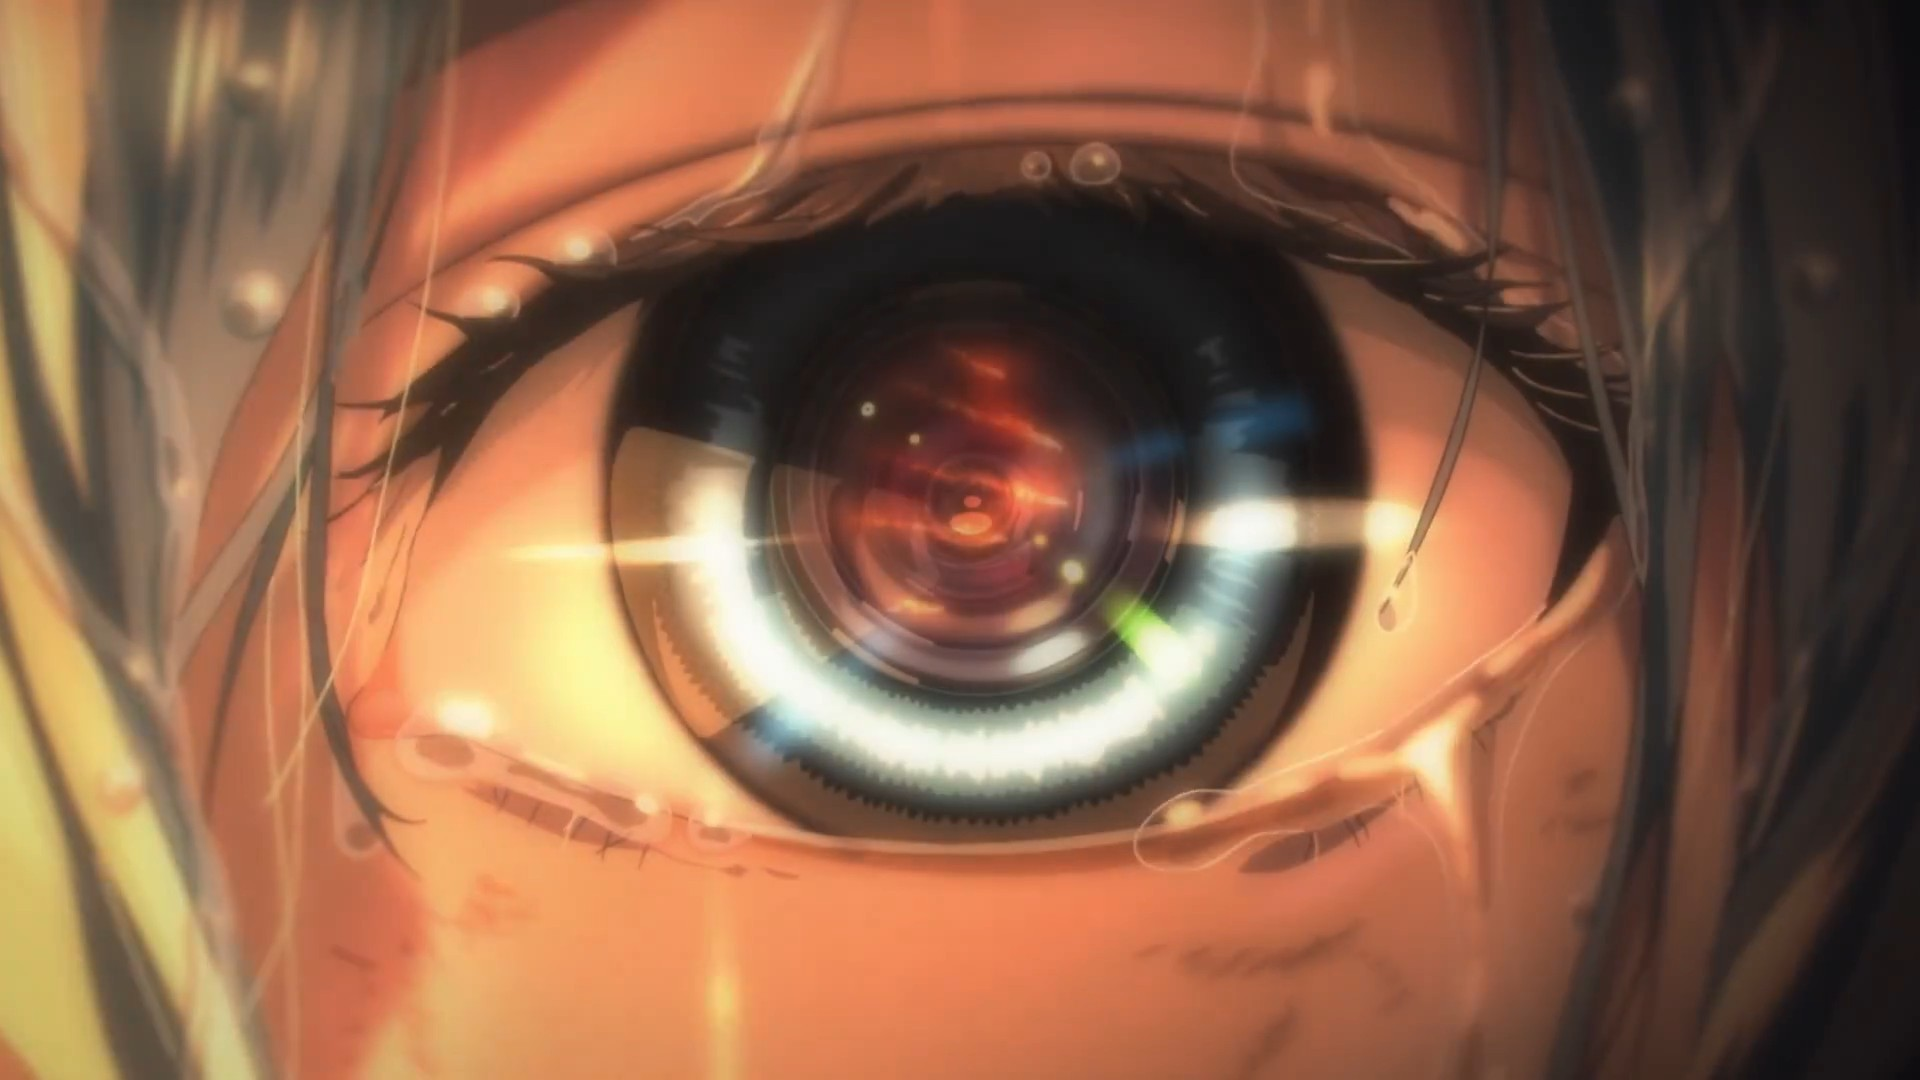 【动漫情报】WIT STUDIO原创动画《Vivy -Fluorite Eye's Song-》第一弹PV公开,4月3日开播